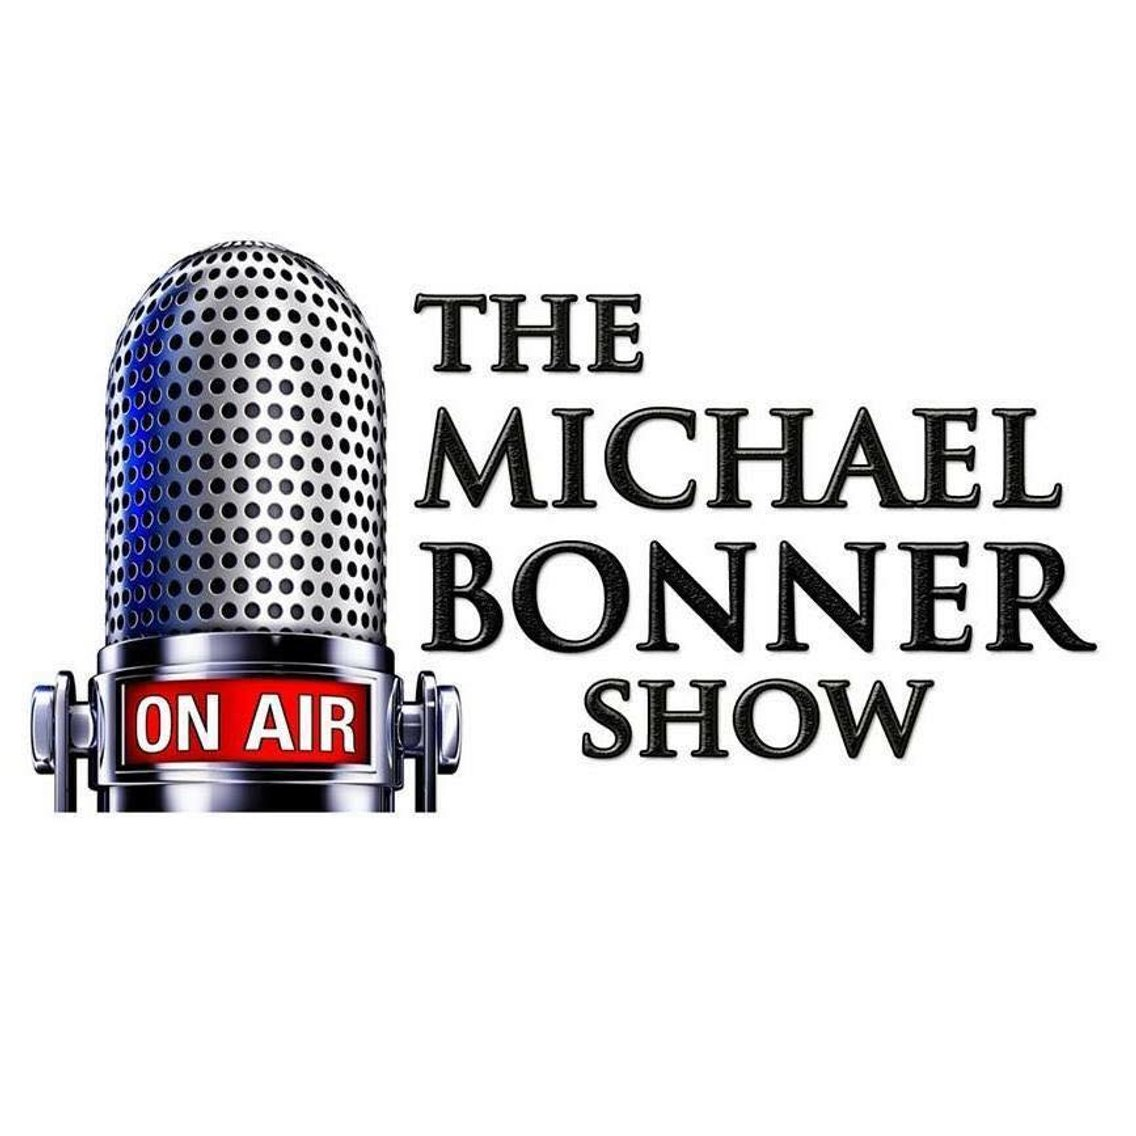 The Michael Bonner Show - immagine di copertina